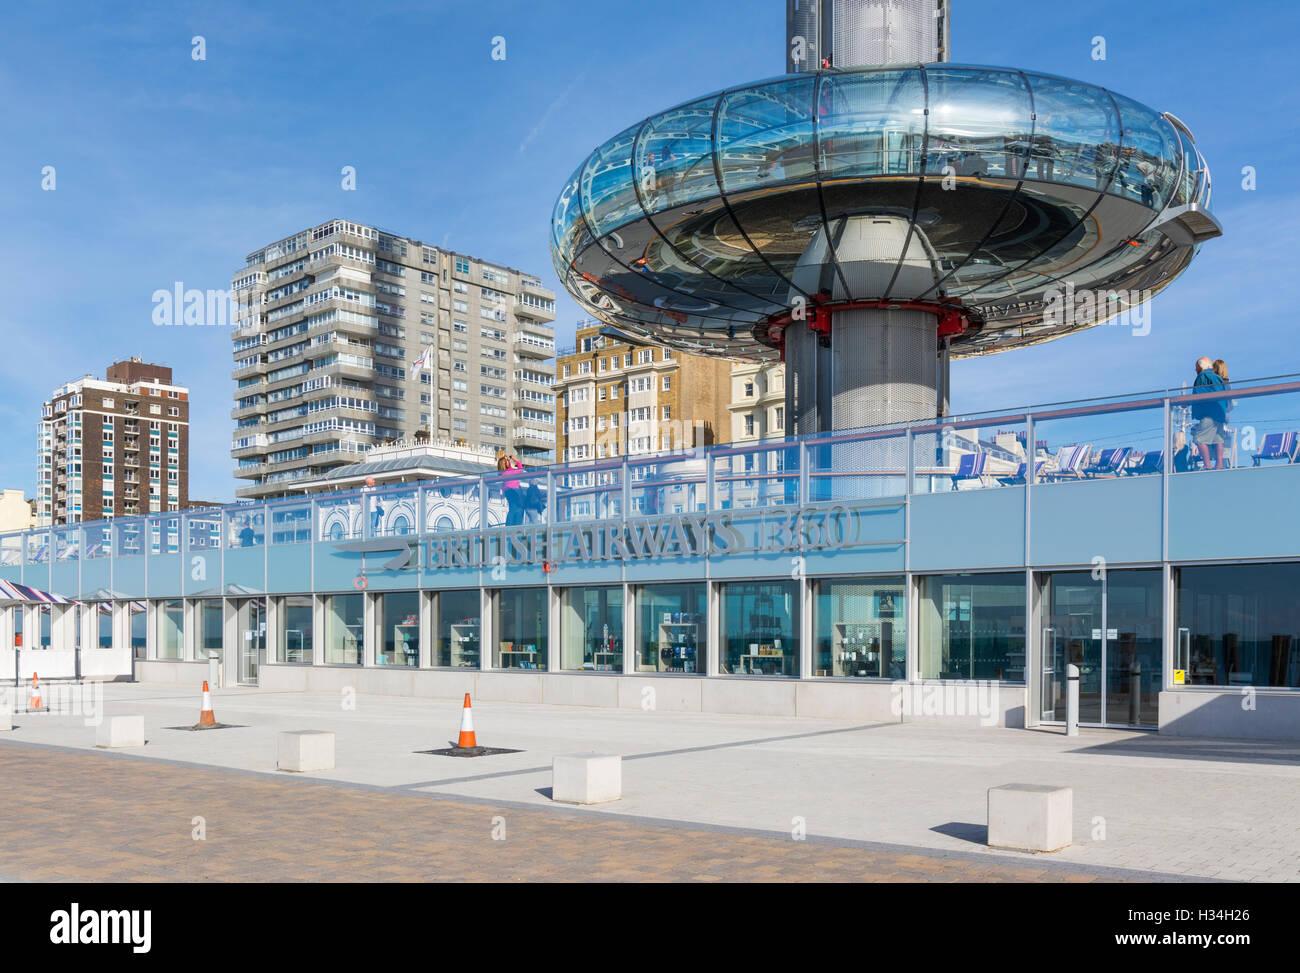 BA i360. British Airways i360 Observation Tower at ground level in Brighton, East Sussex, England, UK. i360 Brighton - Stock Image